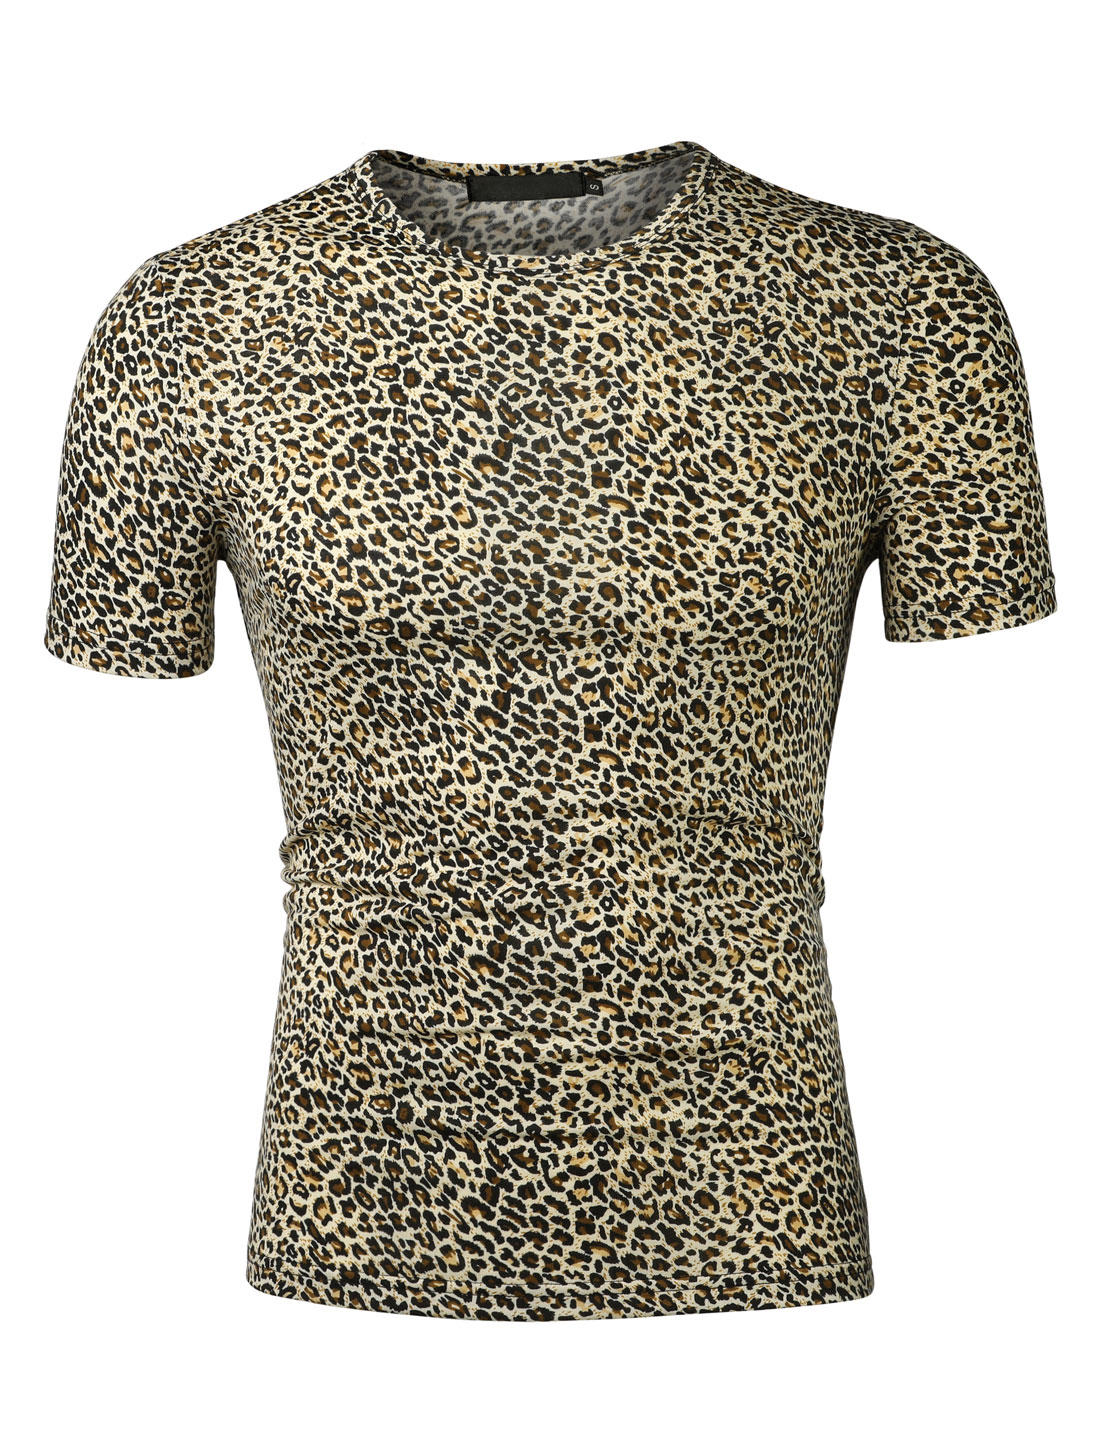 Men Beige Black Short-sleeved Leopard Prints Slim Casual Tee Shirt L